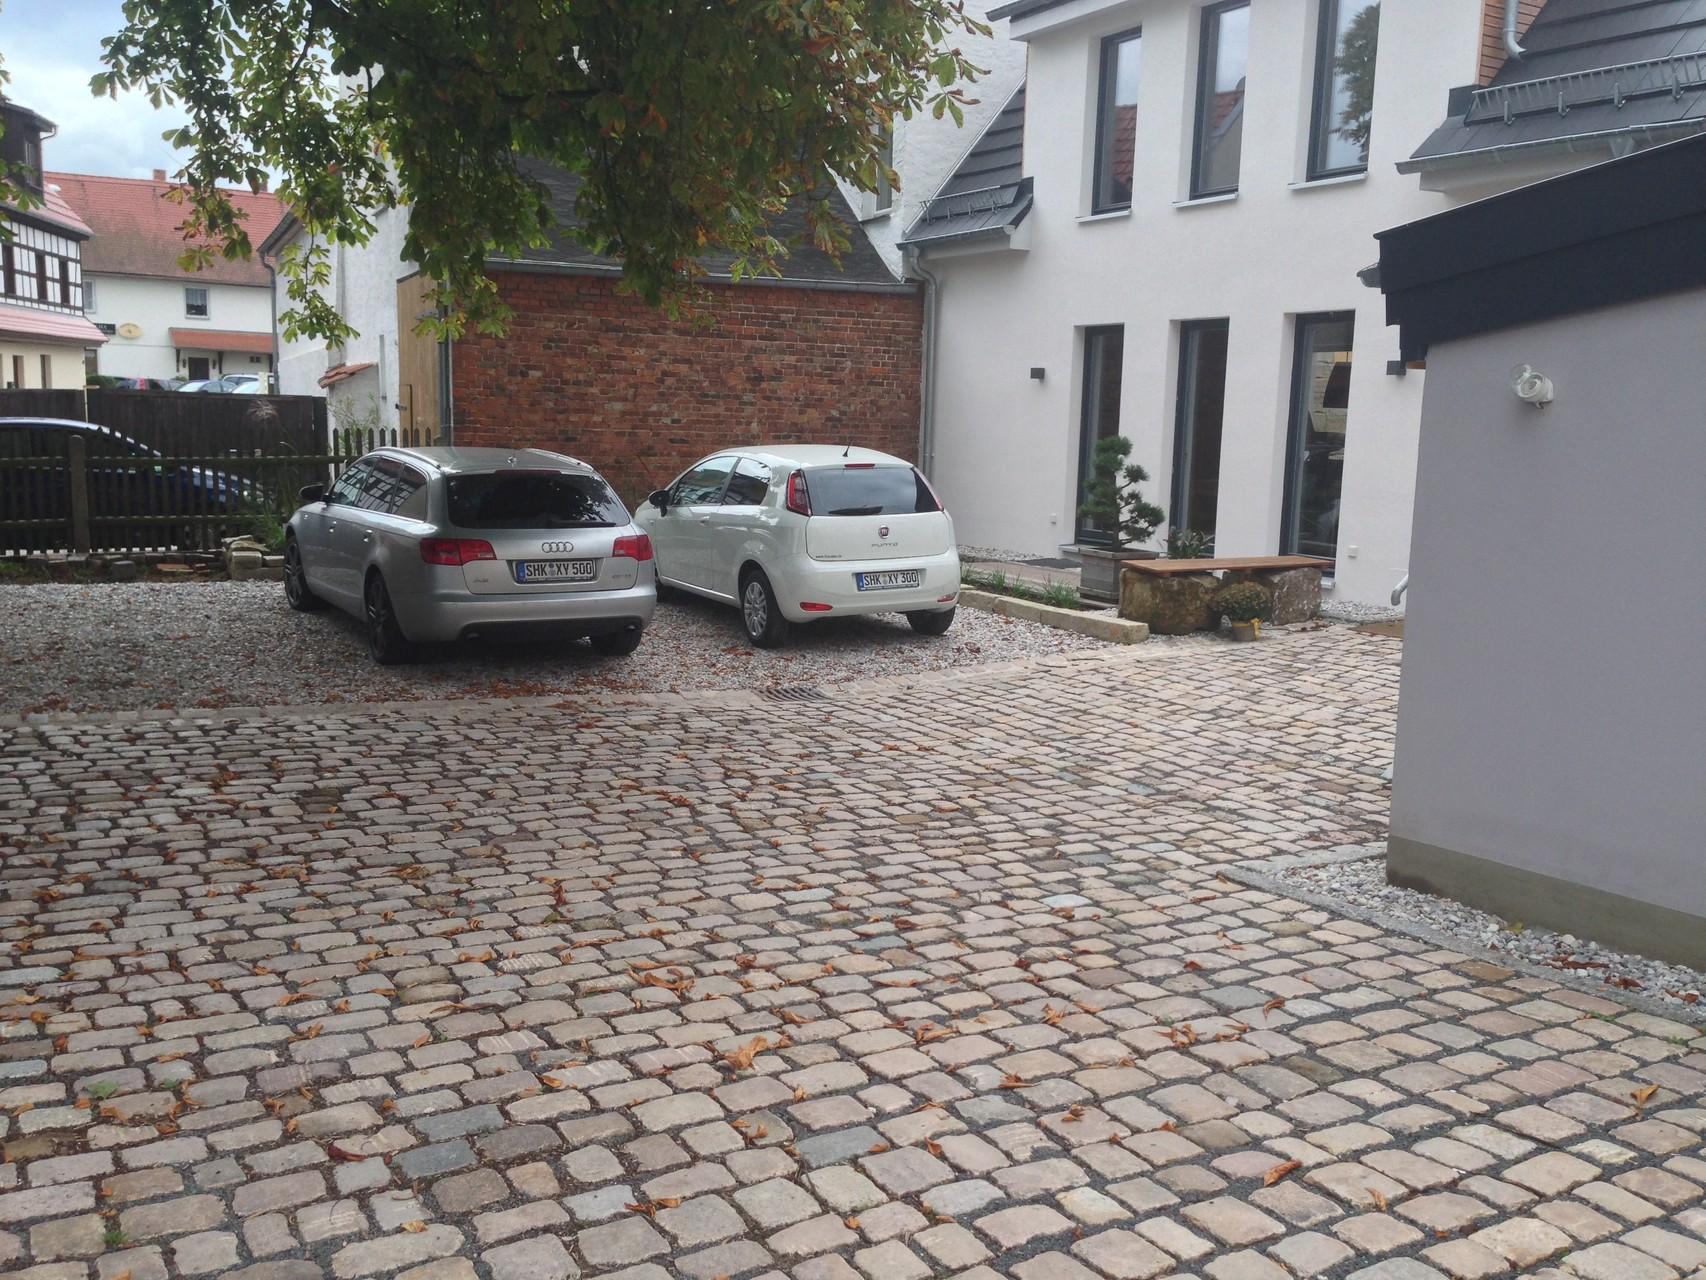 hinterhofgestaltung, landschaftsbau hermsdorf - tiefbau pflasterbau straßenbau hermsdorf, Design ideen